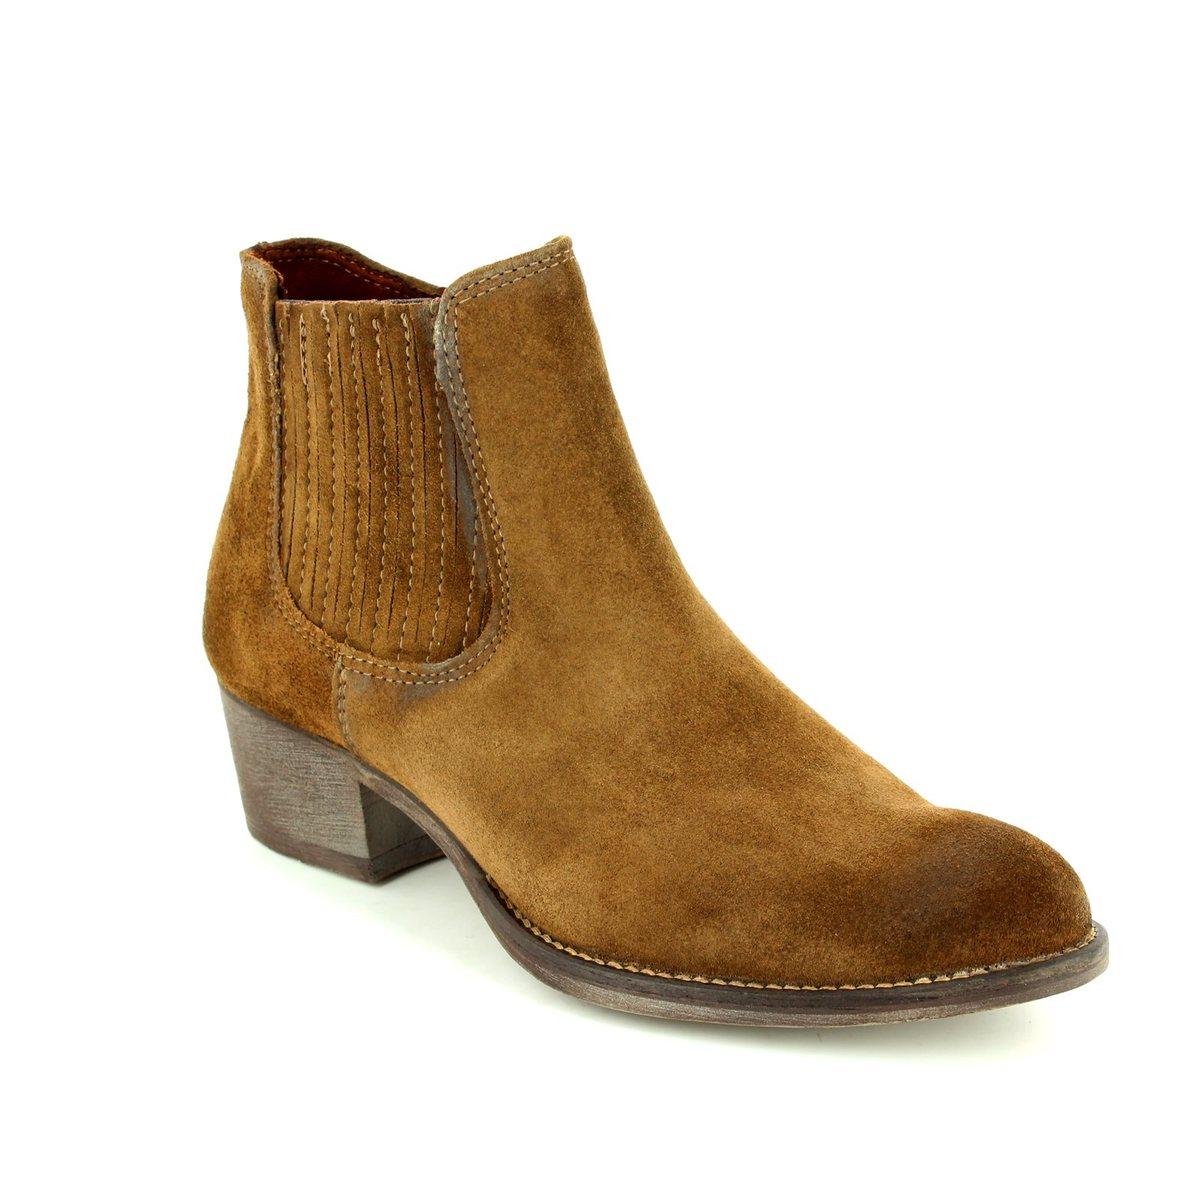 5cdb03d98697 Tamaris Ankle Boots - Brown Suede - 25341 319 GENOVA